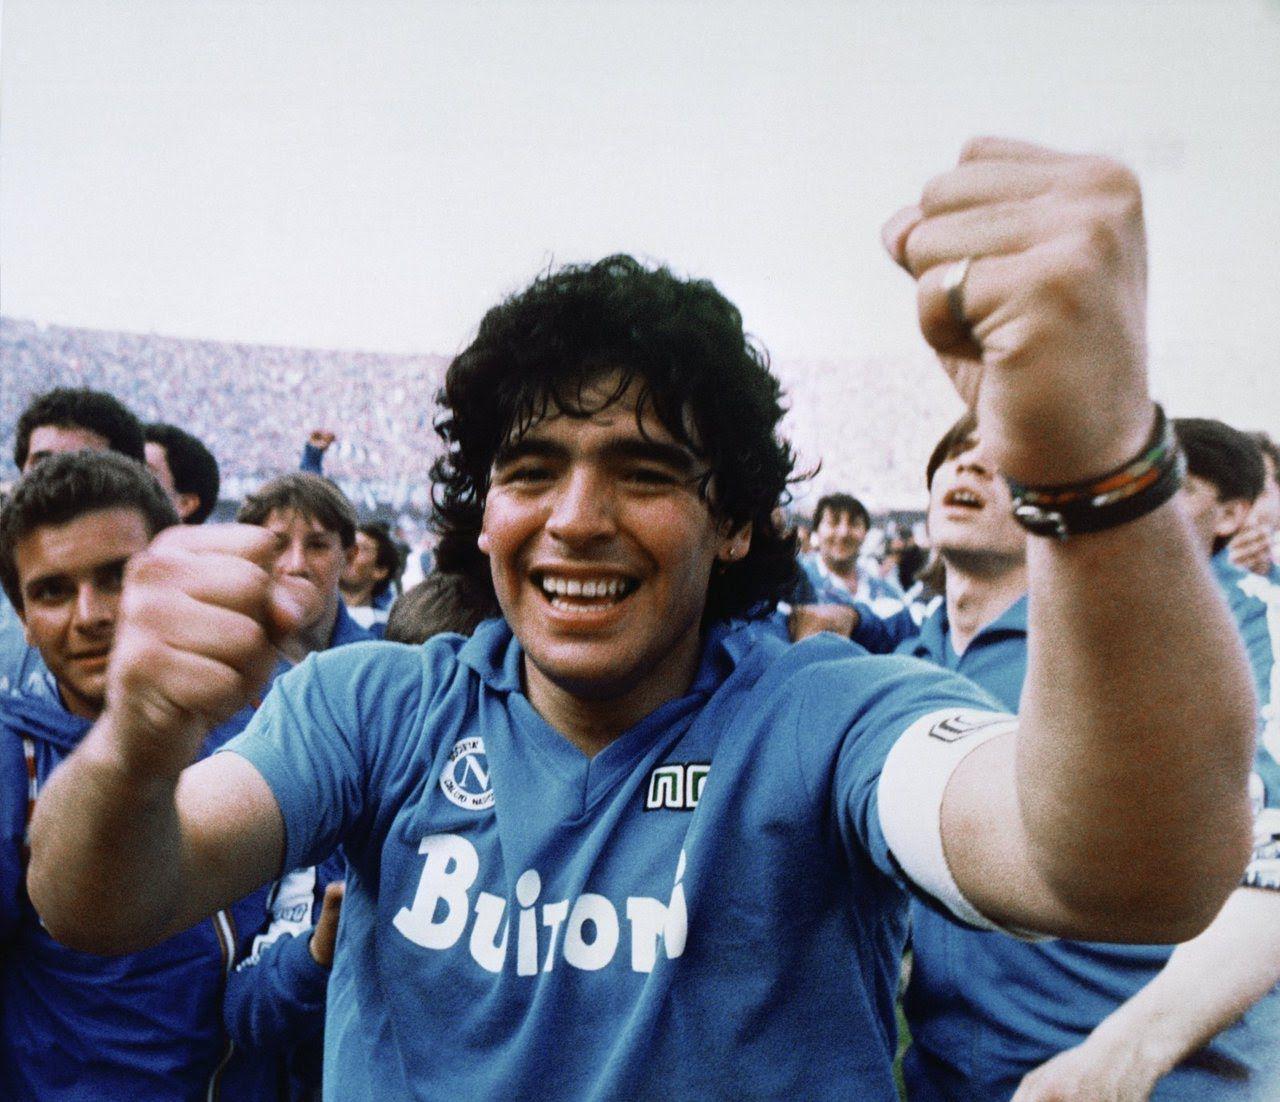 De eeuwige liefde tussen Maradona en maffiastad Napels